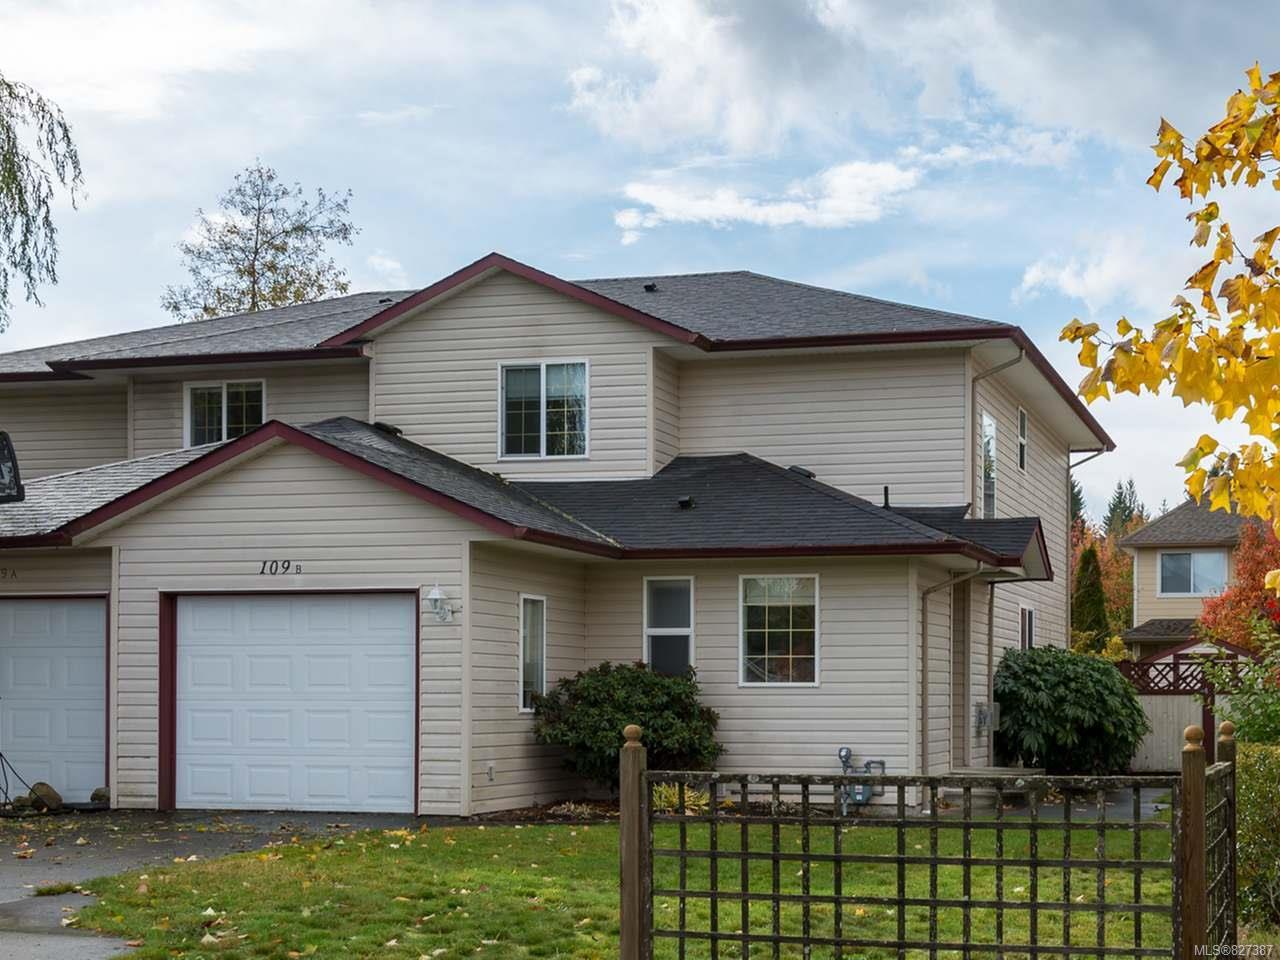 Main Photo: B 109 Timberlane Rd in COURTENAY: CV Courtenay West Half Duplex for sale (Comox Valley)  : MLS®# 827387